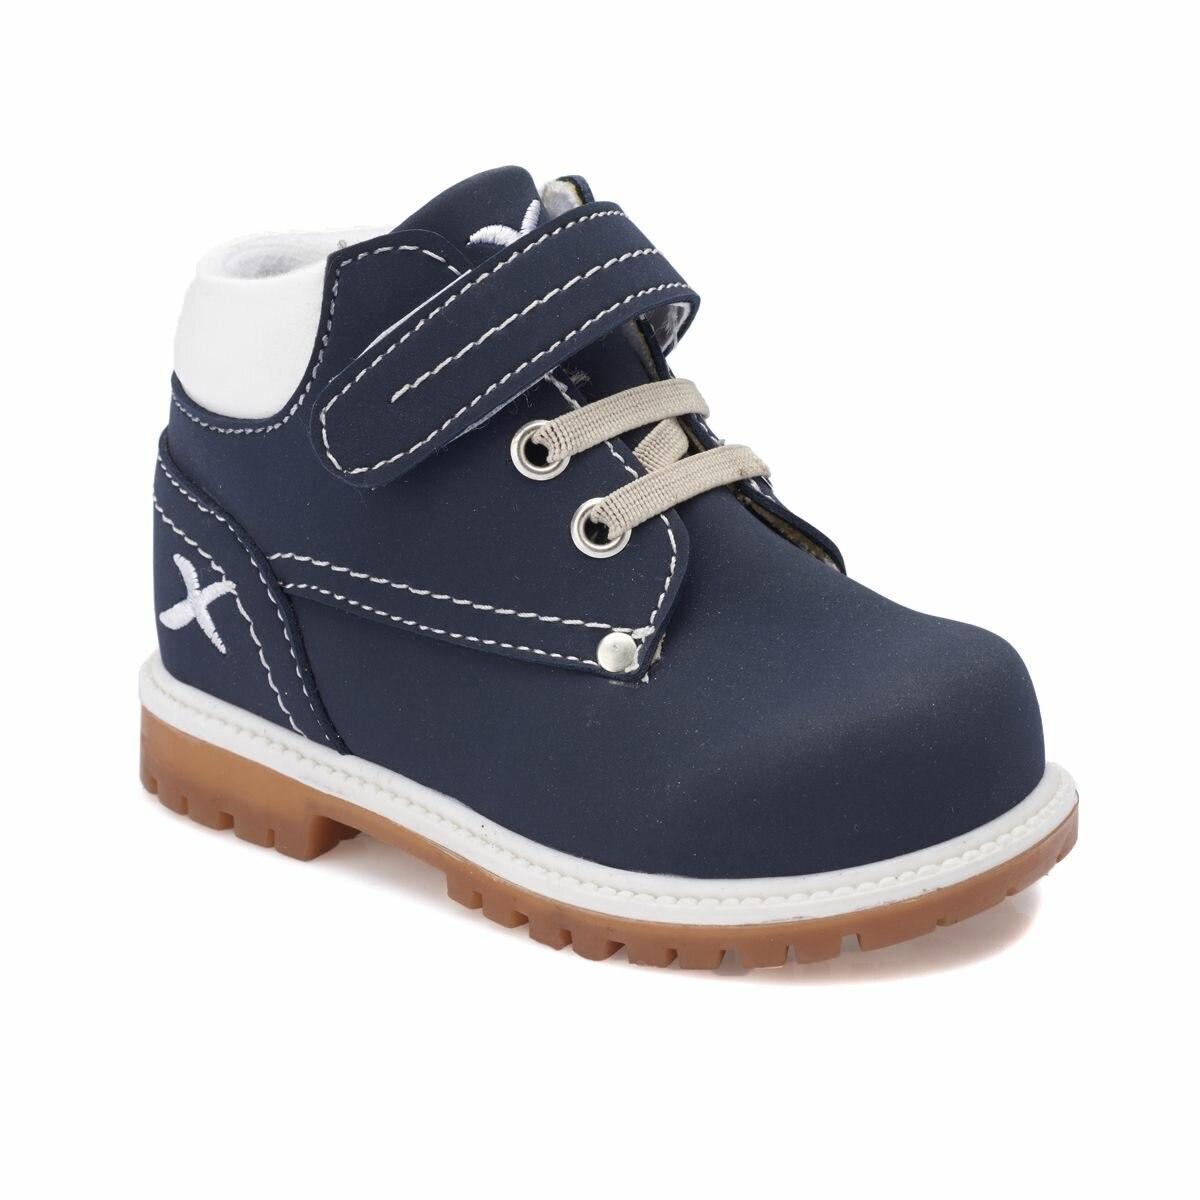 FLO MOIRA Navy Blue Male Child Boots KINETIX